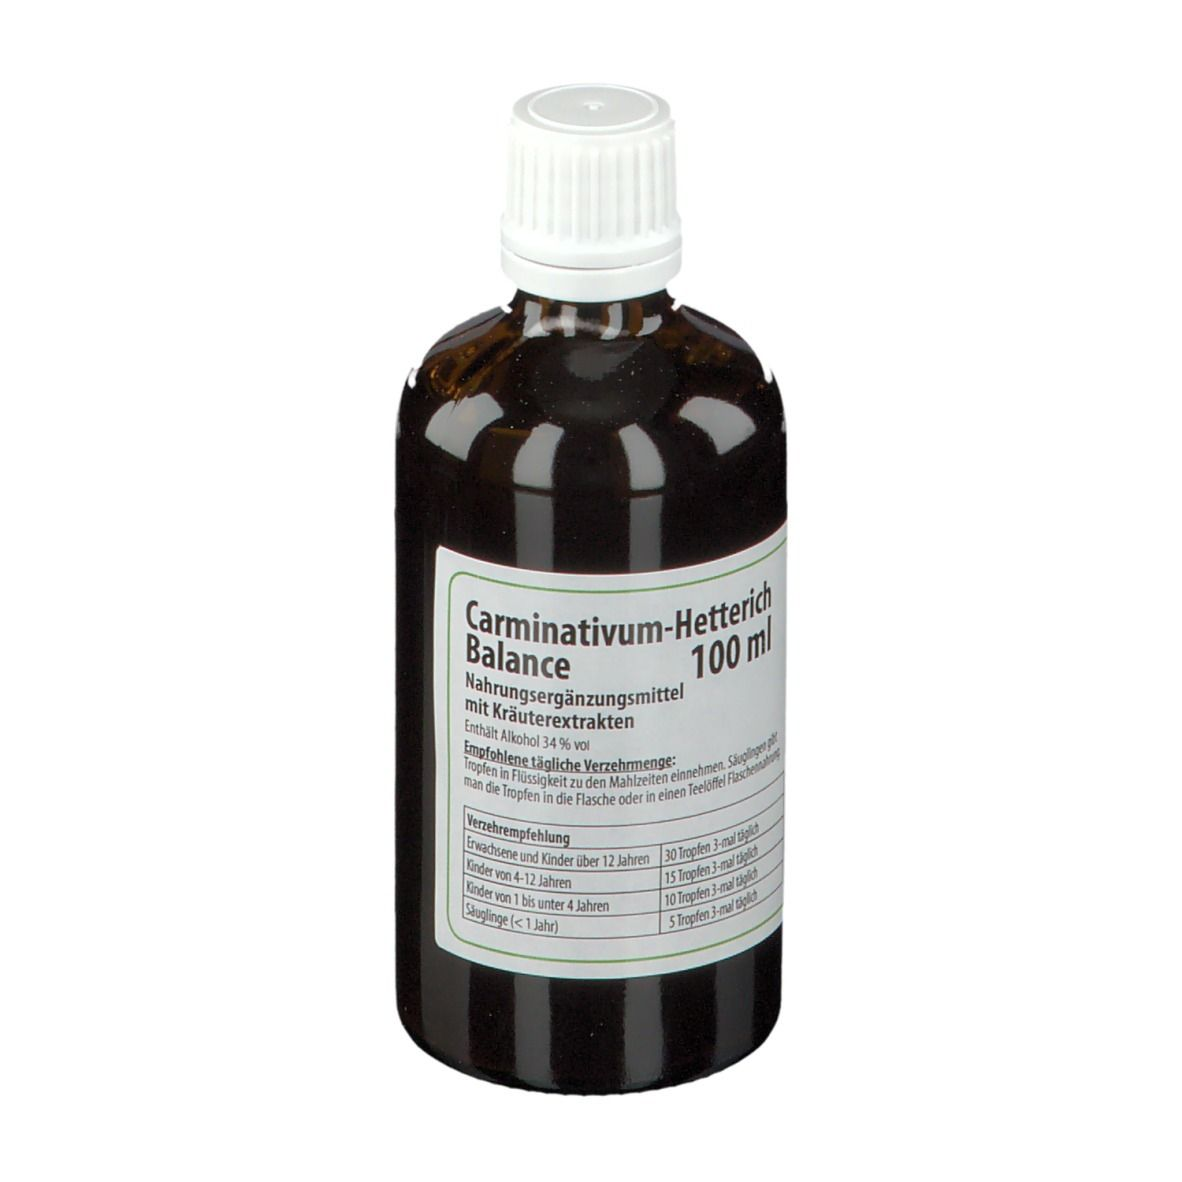 Image of Carminativum-Hetterich® Balance